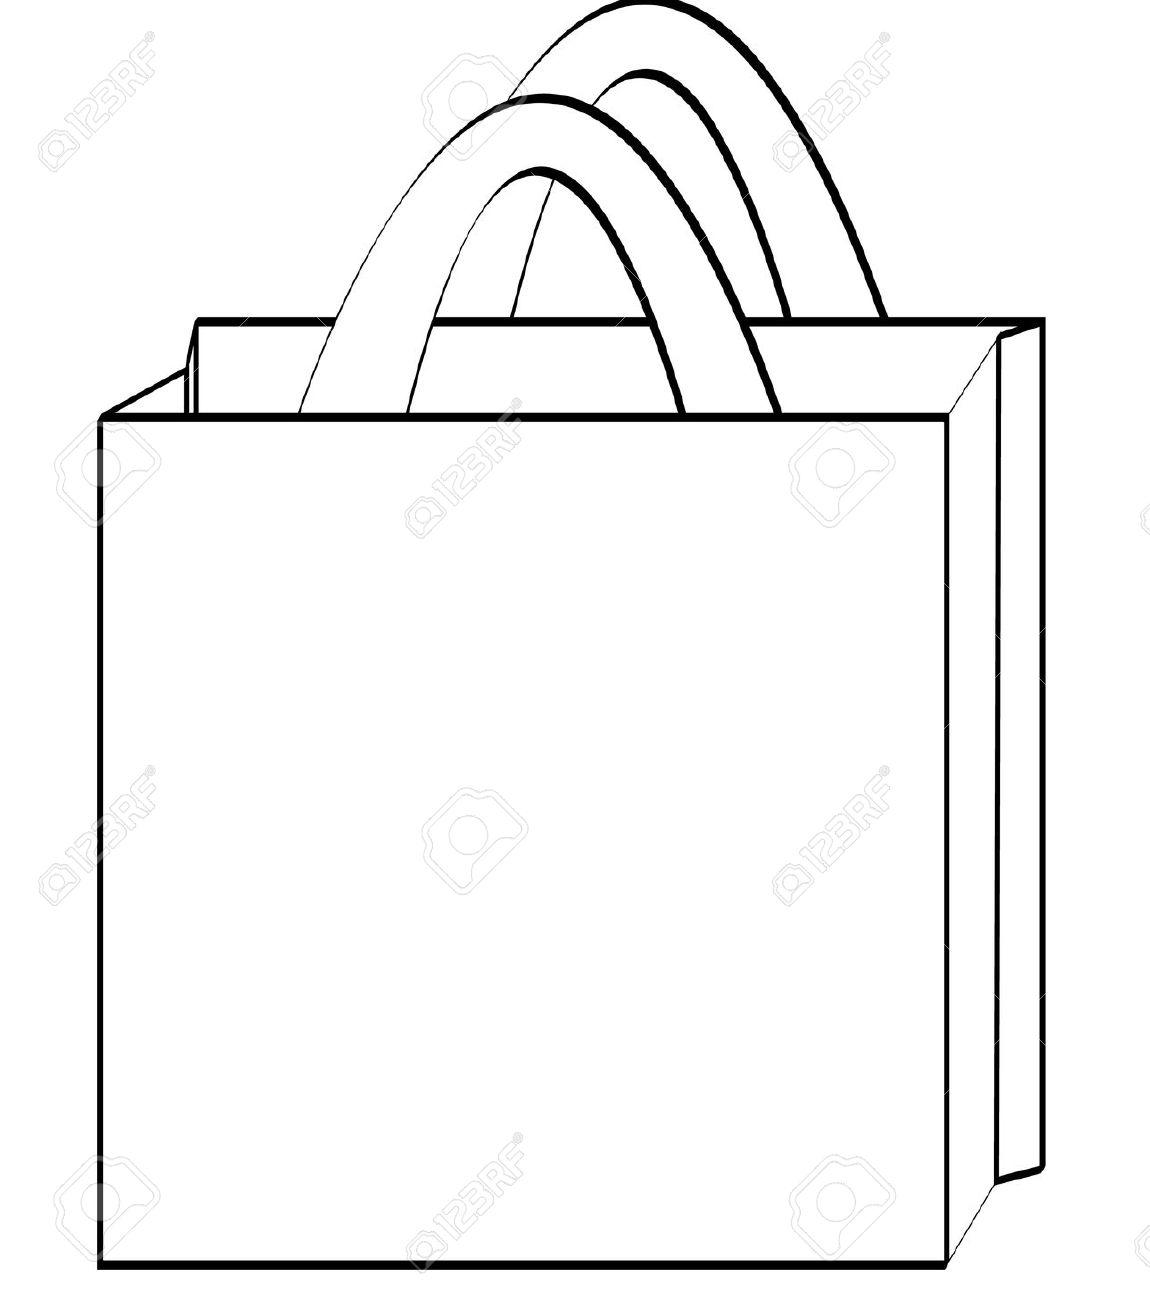 Carrier Bag Clipart